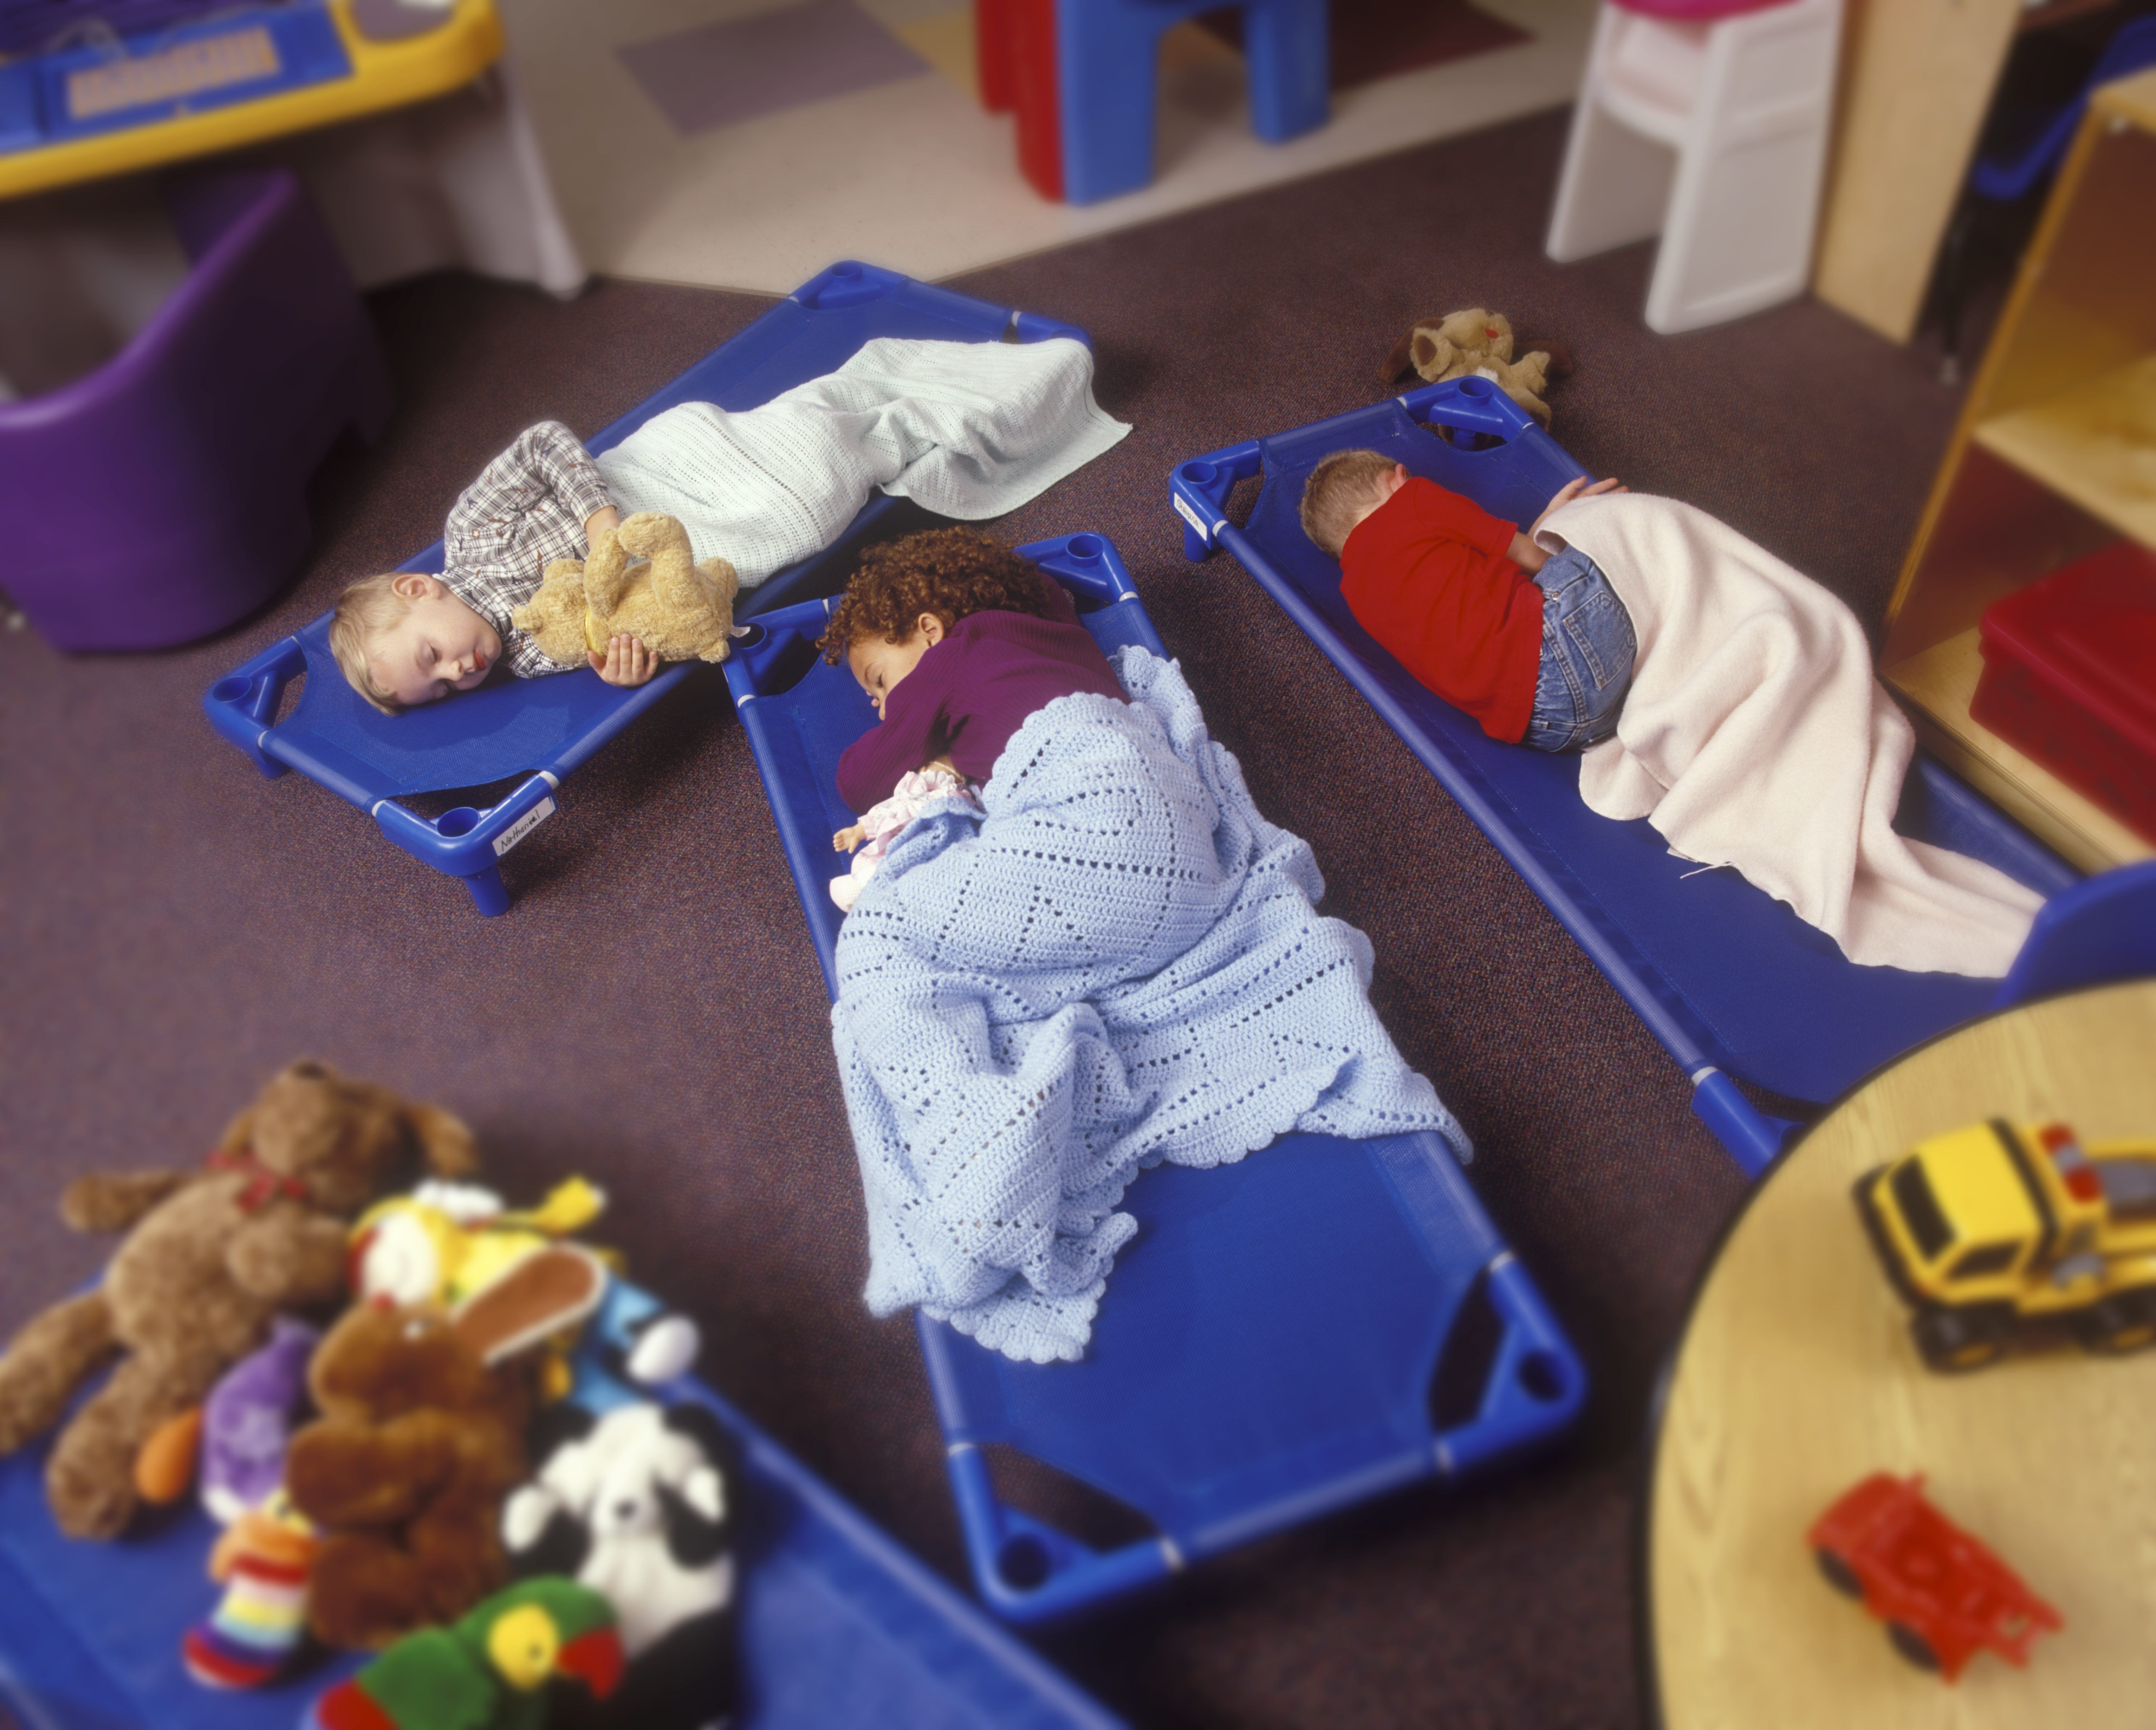 Children Preschool Classroom childcare daycare nap child